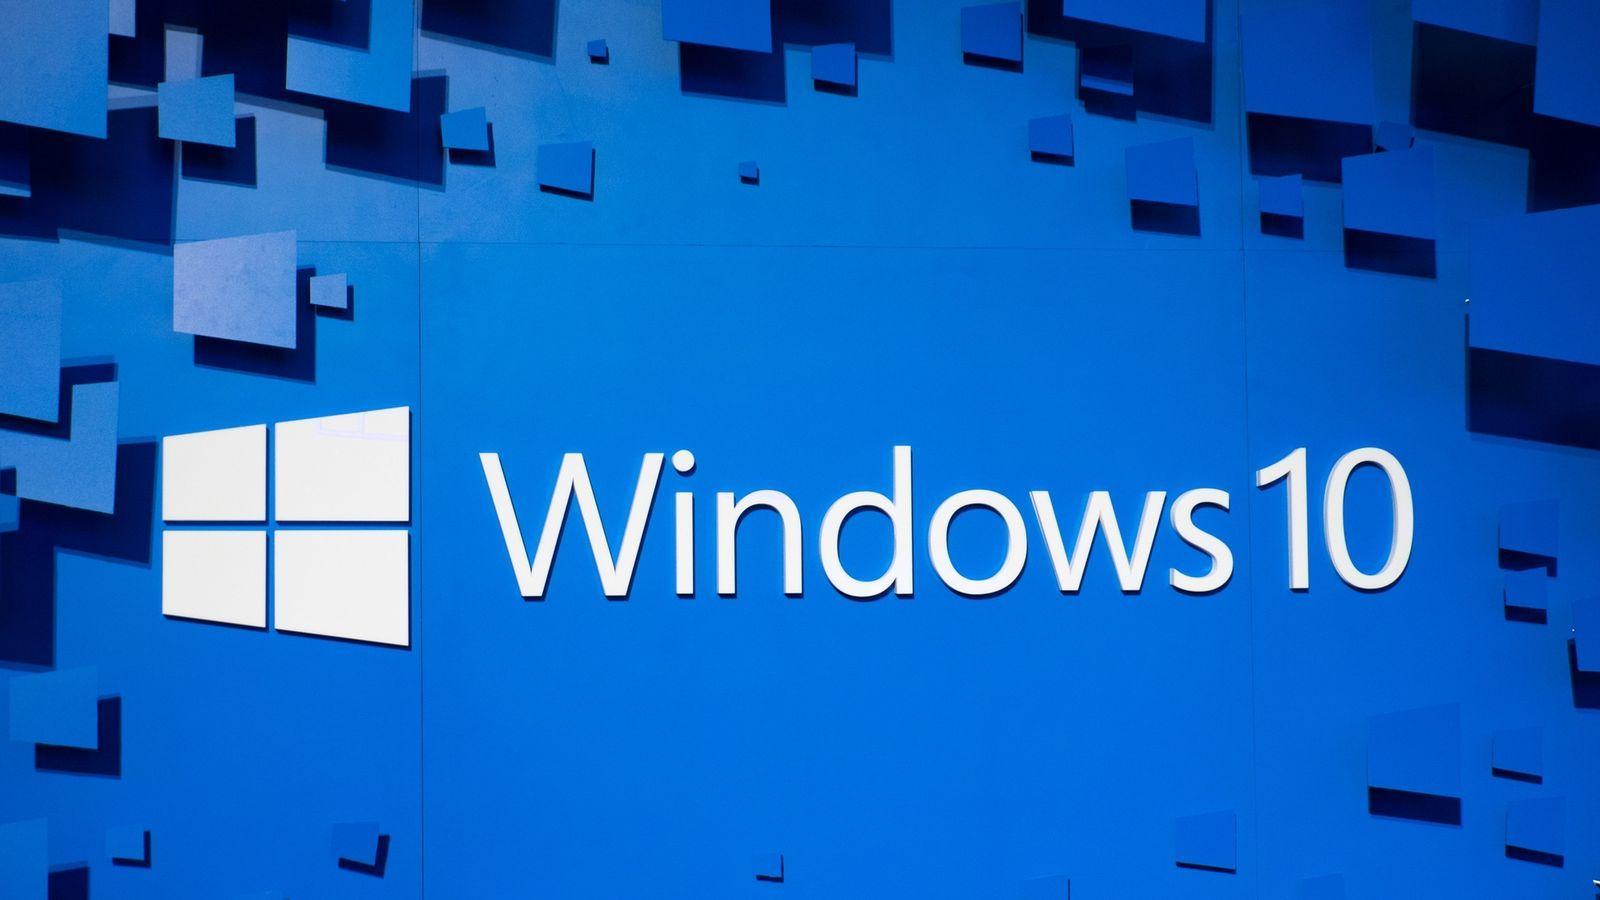 3840x2160 3840x2160 Windows Wallpaper Wallpaper Windows 10 Background Hd Wallpaper